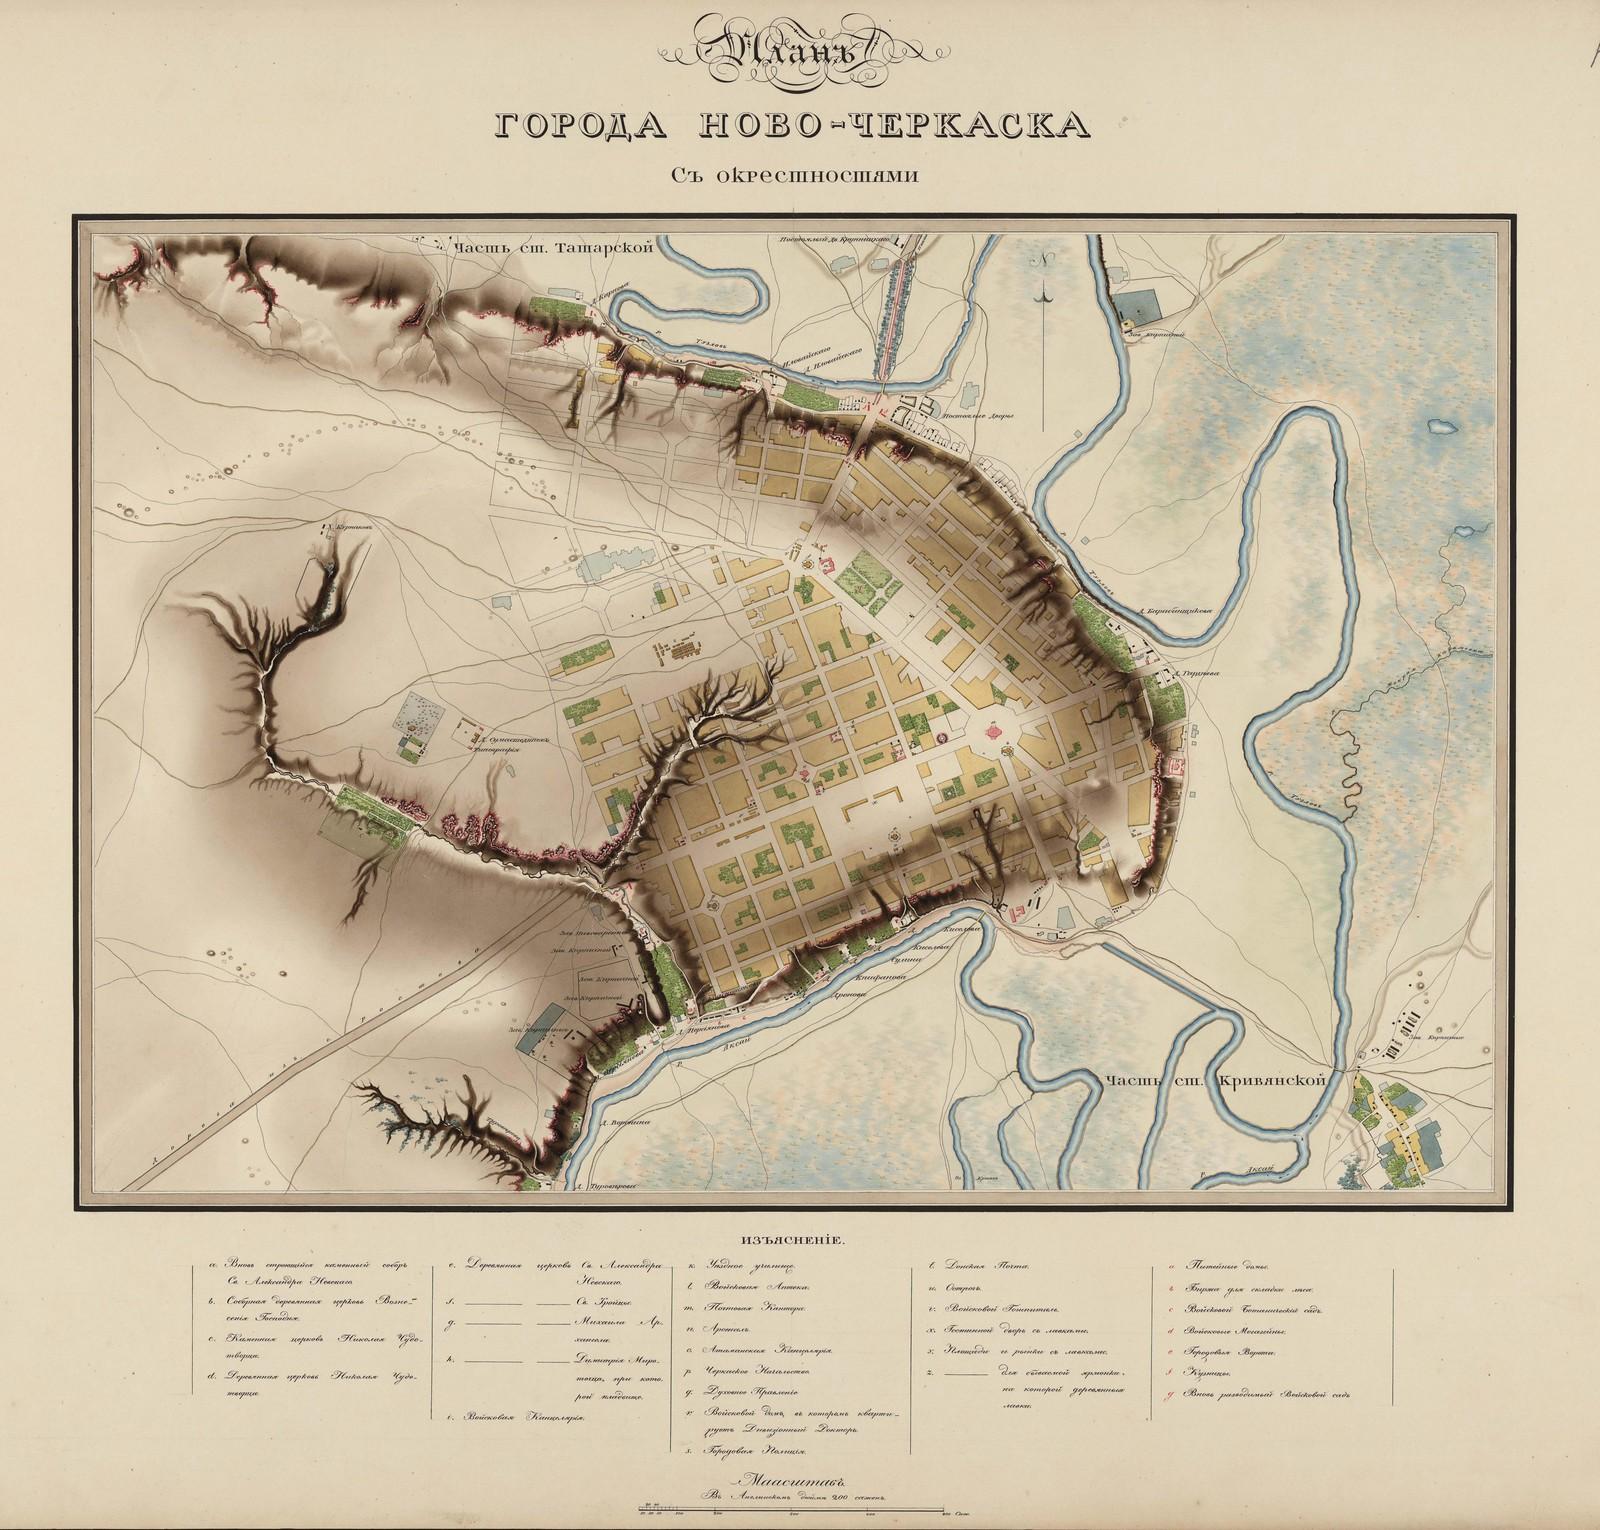 1822. План города Ново-Черкаска